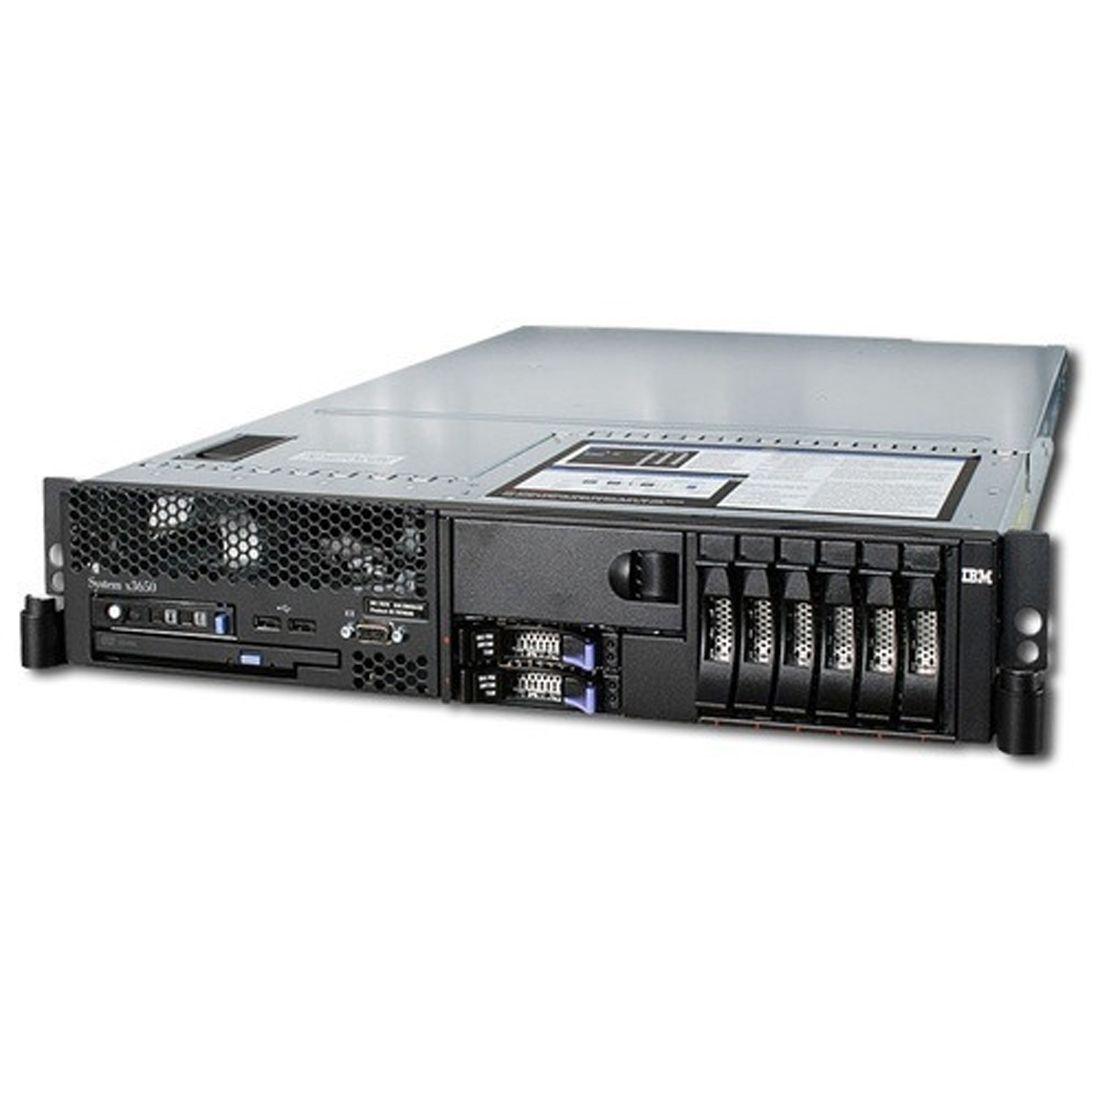 IBM SYSTEM X3650 M1 Server 2 x Intel Xeon E5440 2.83Ghz. CPU + 4GB Ram